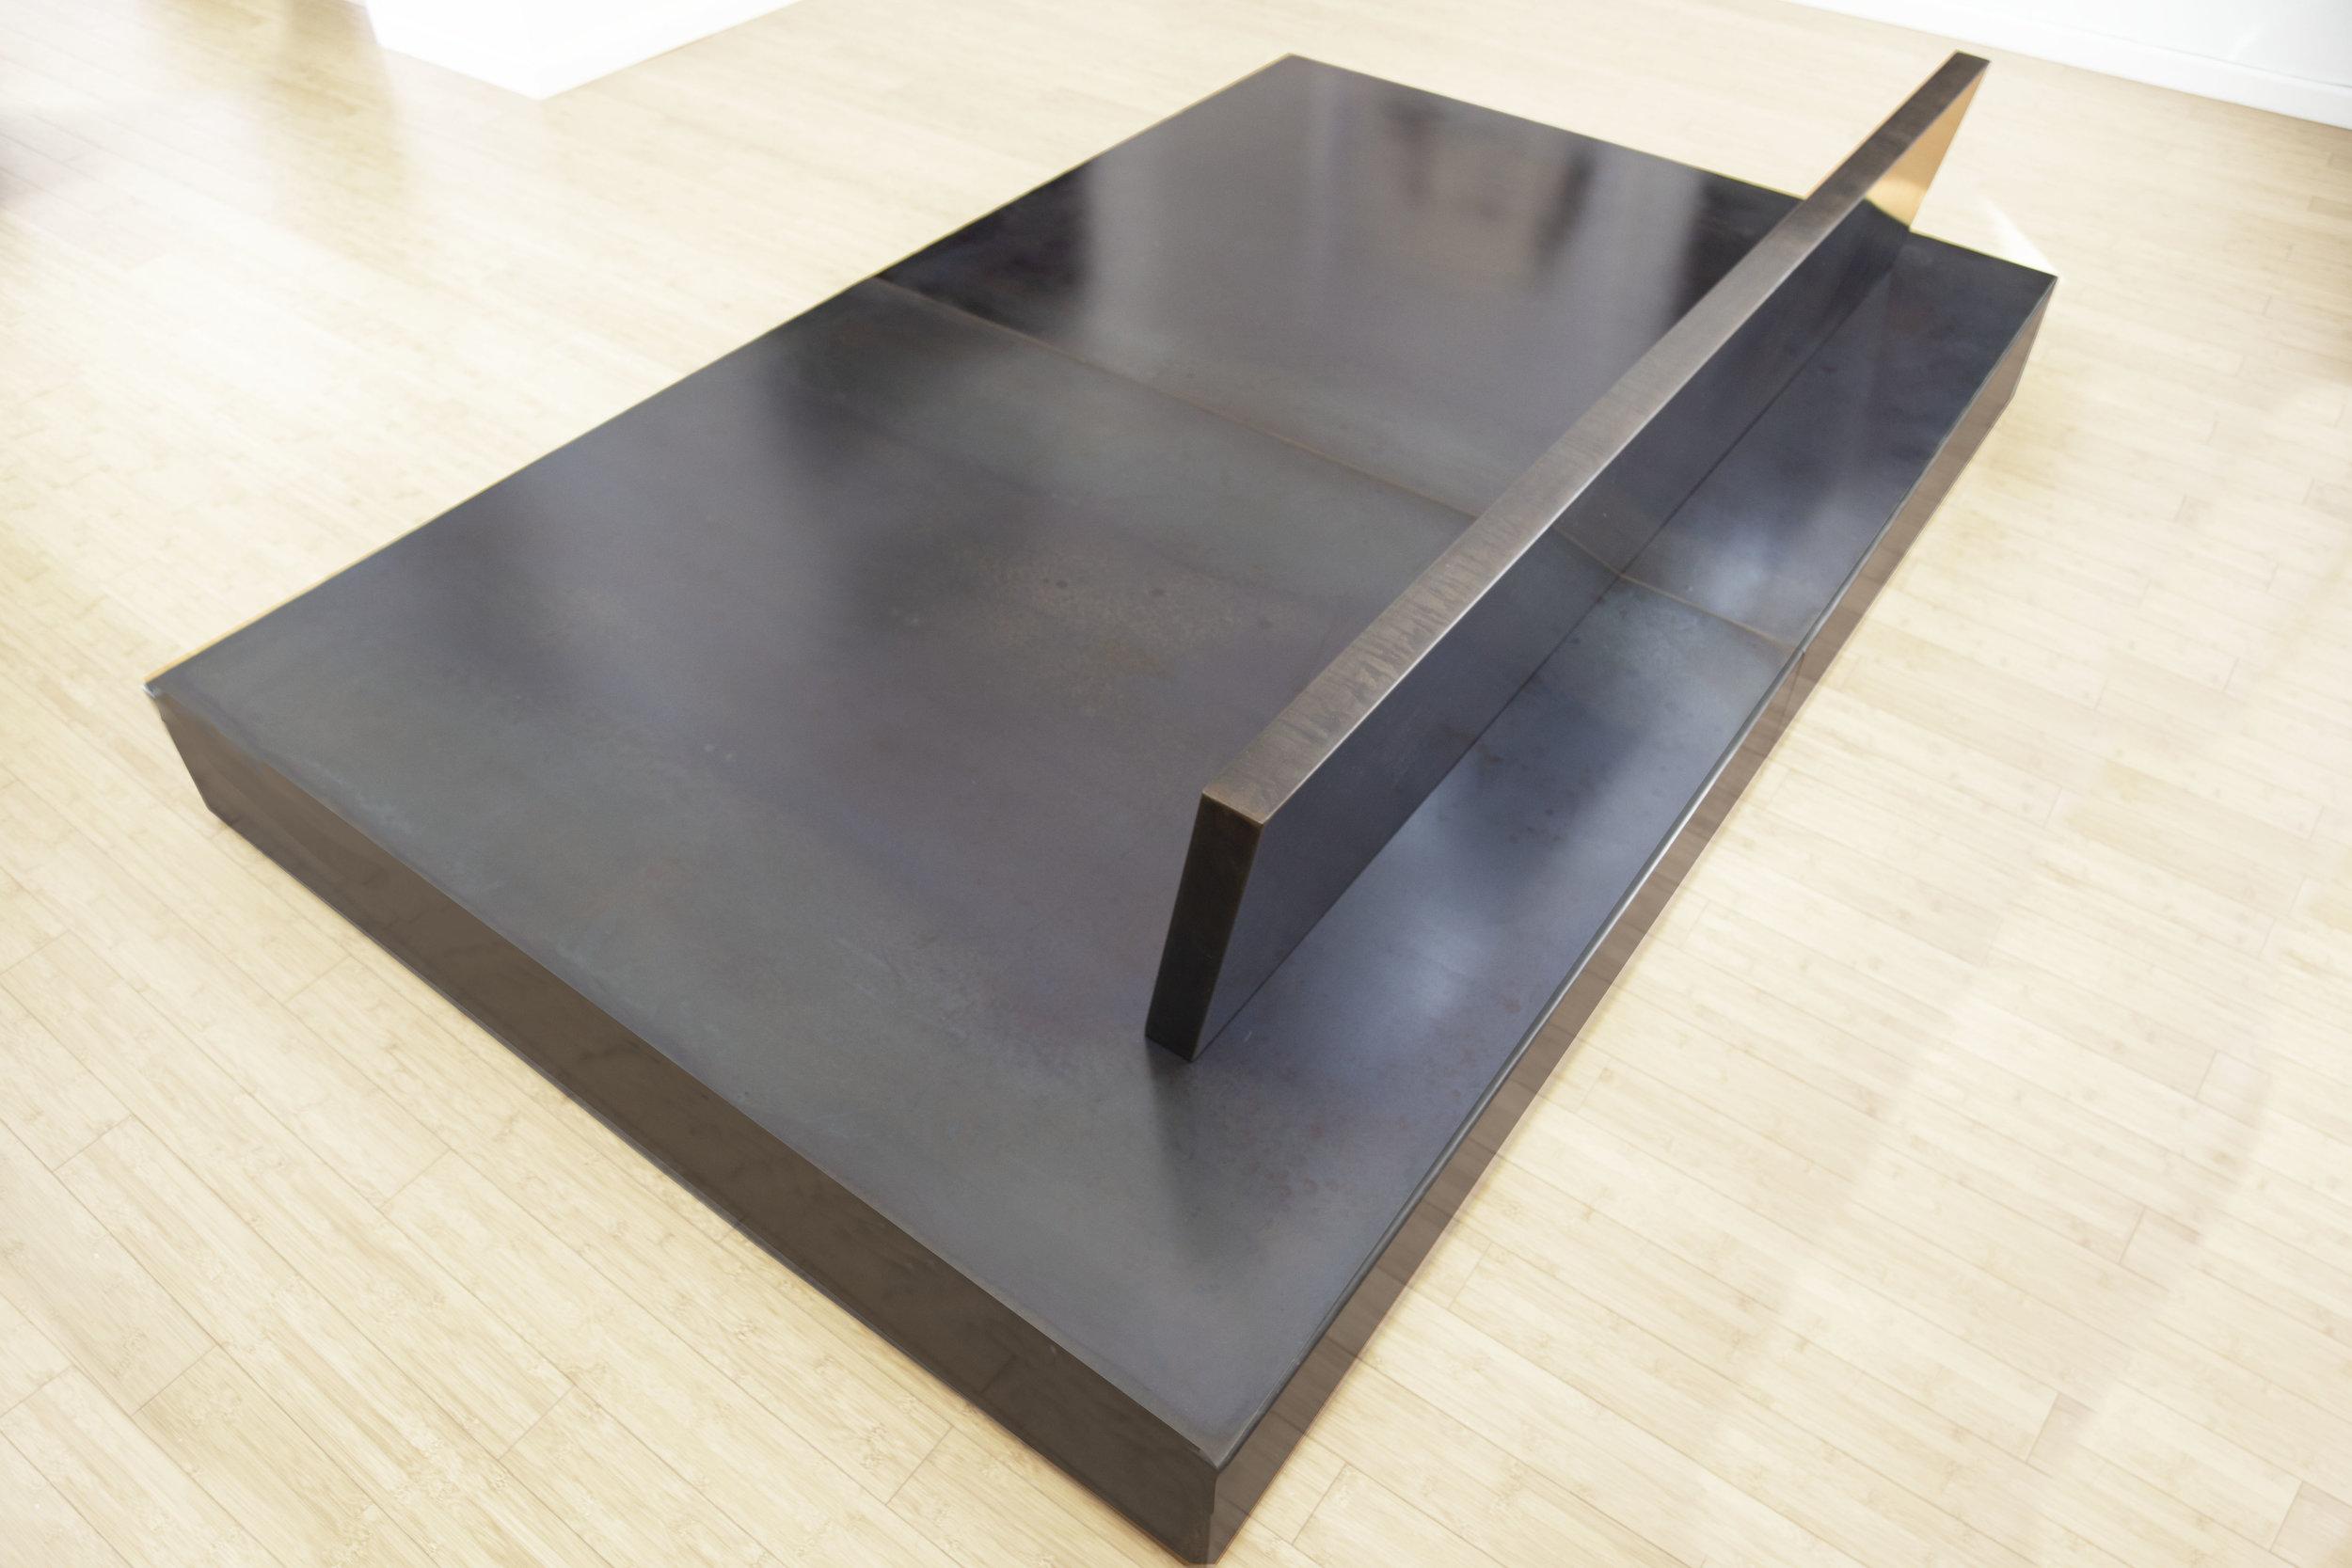 Steel_platform_sofa.jpg